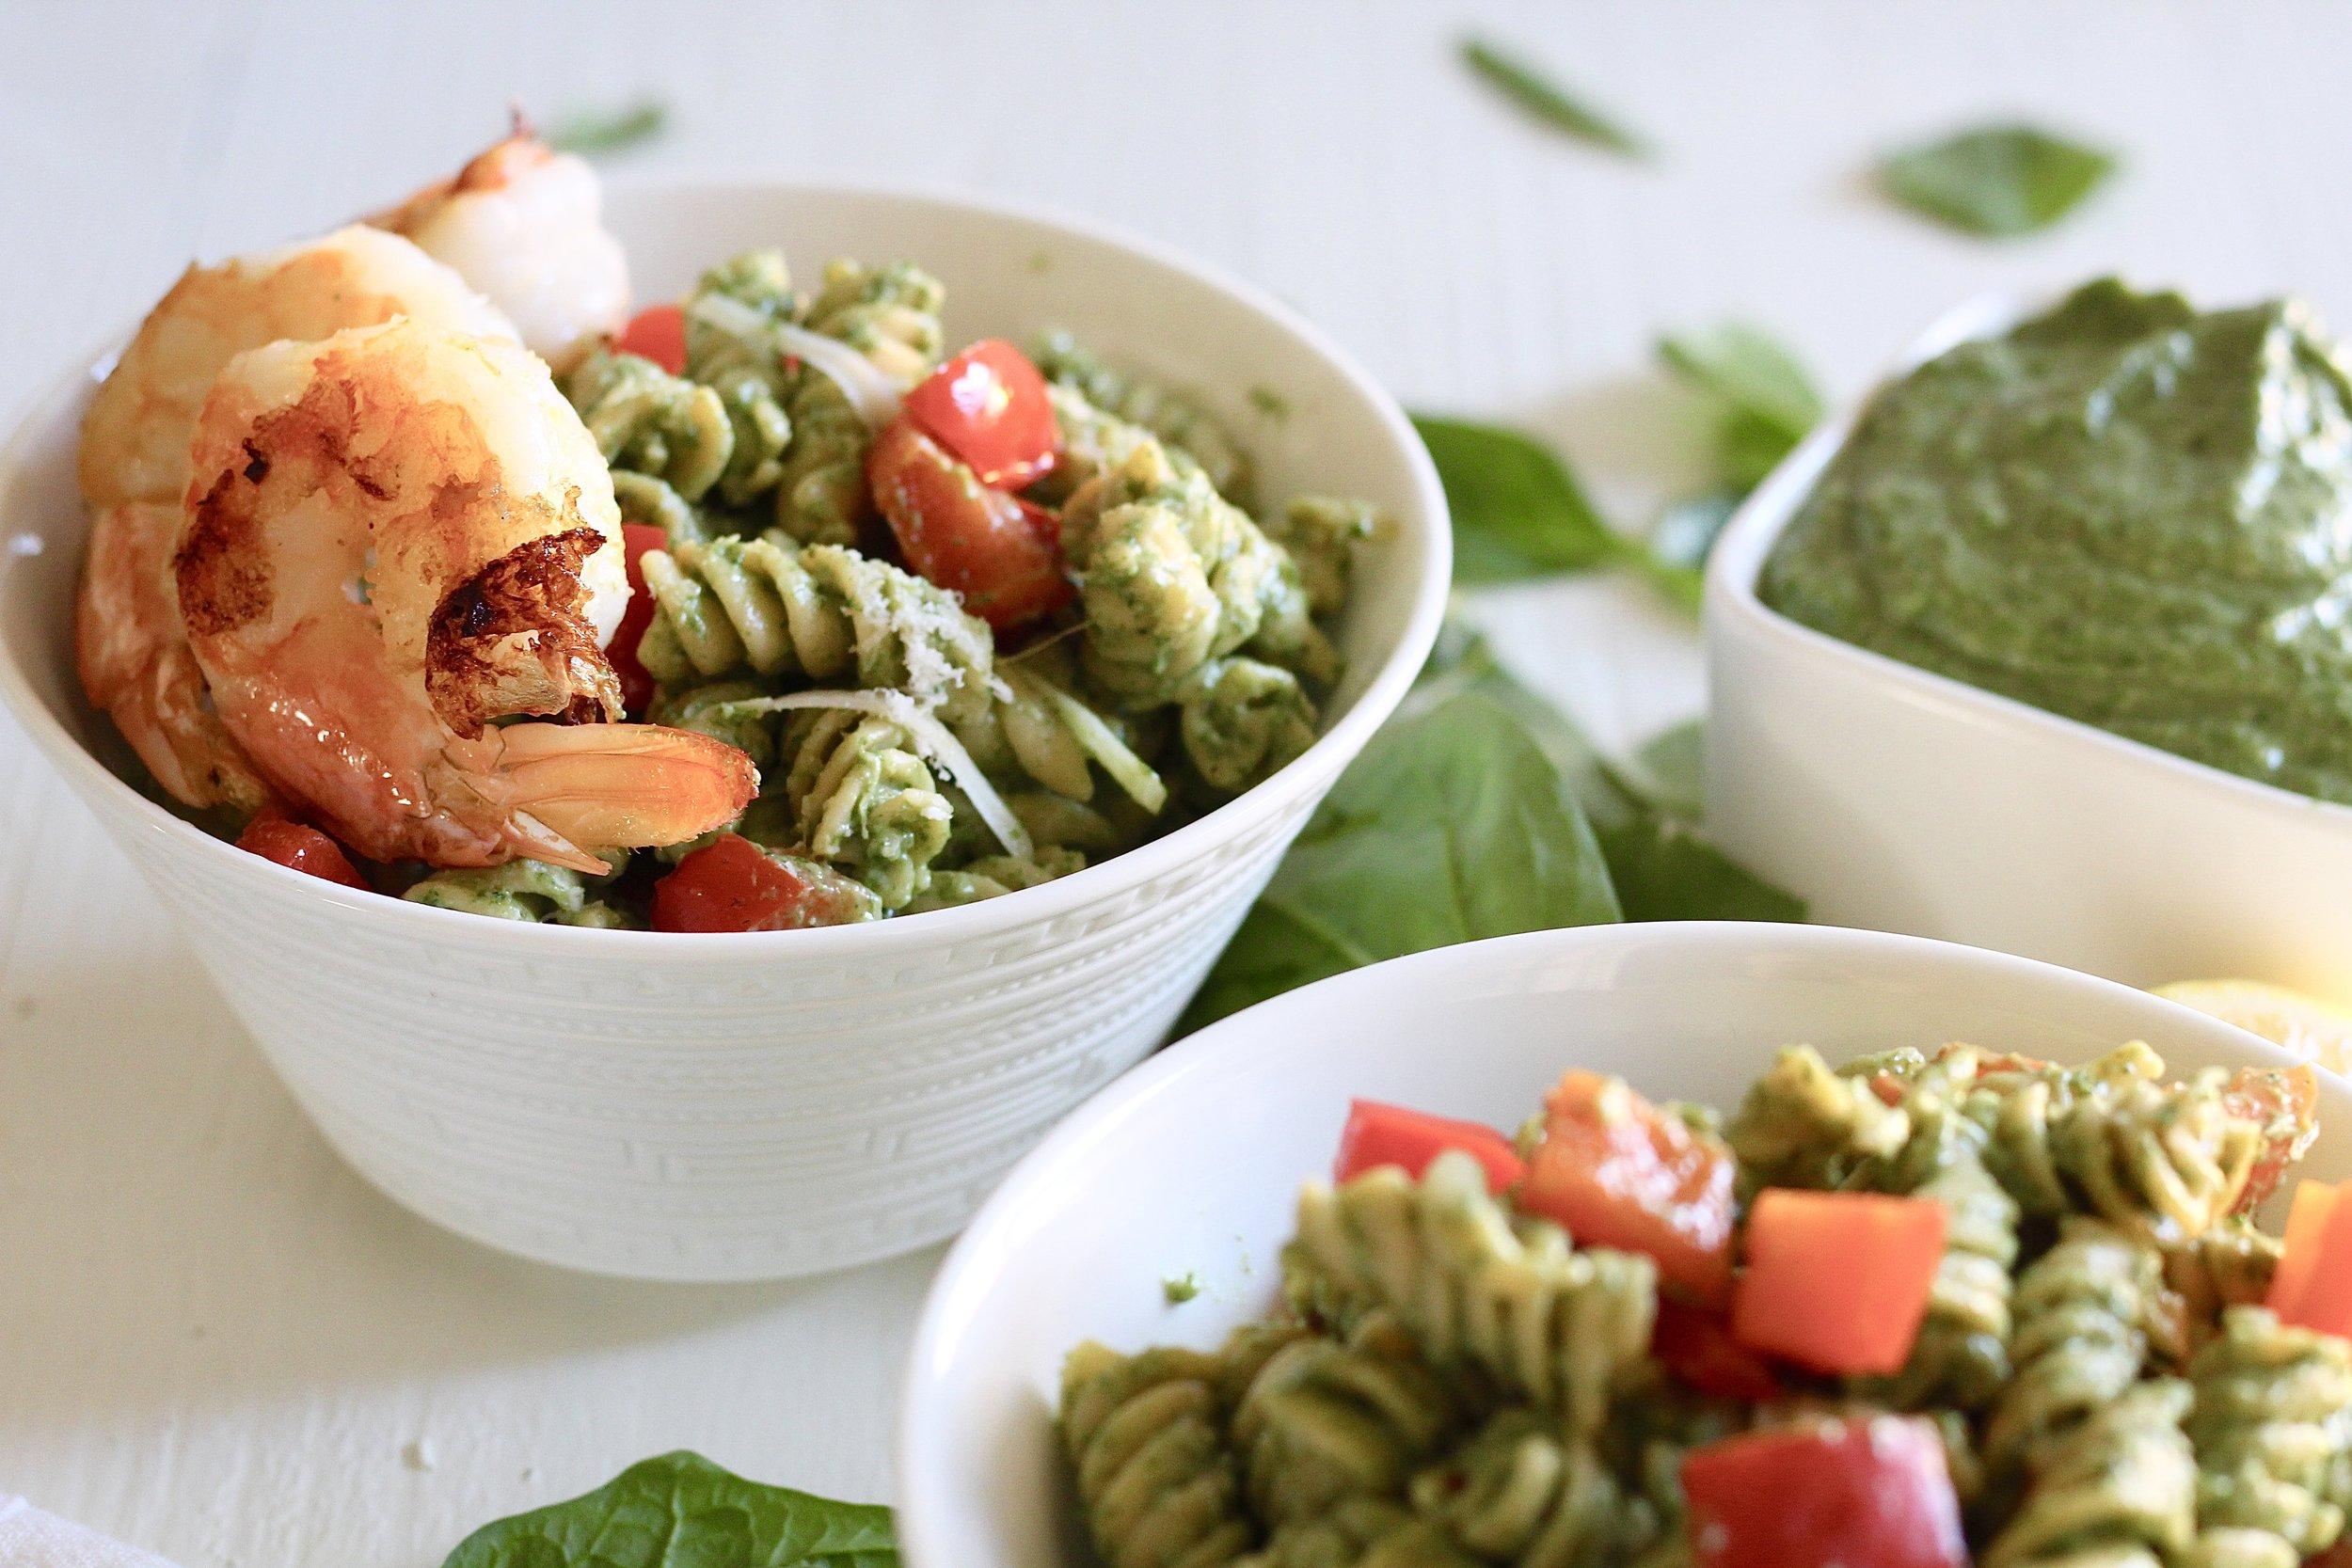 Creamy Spinach Pasta with Shrimp (Gluten Free)